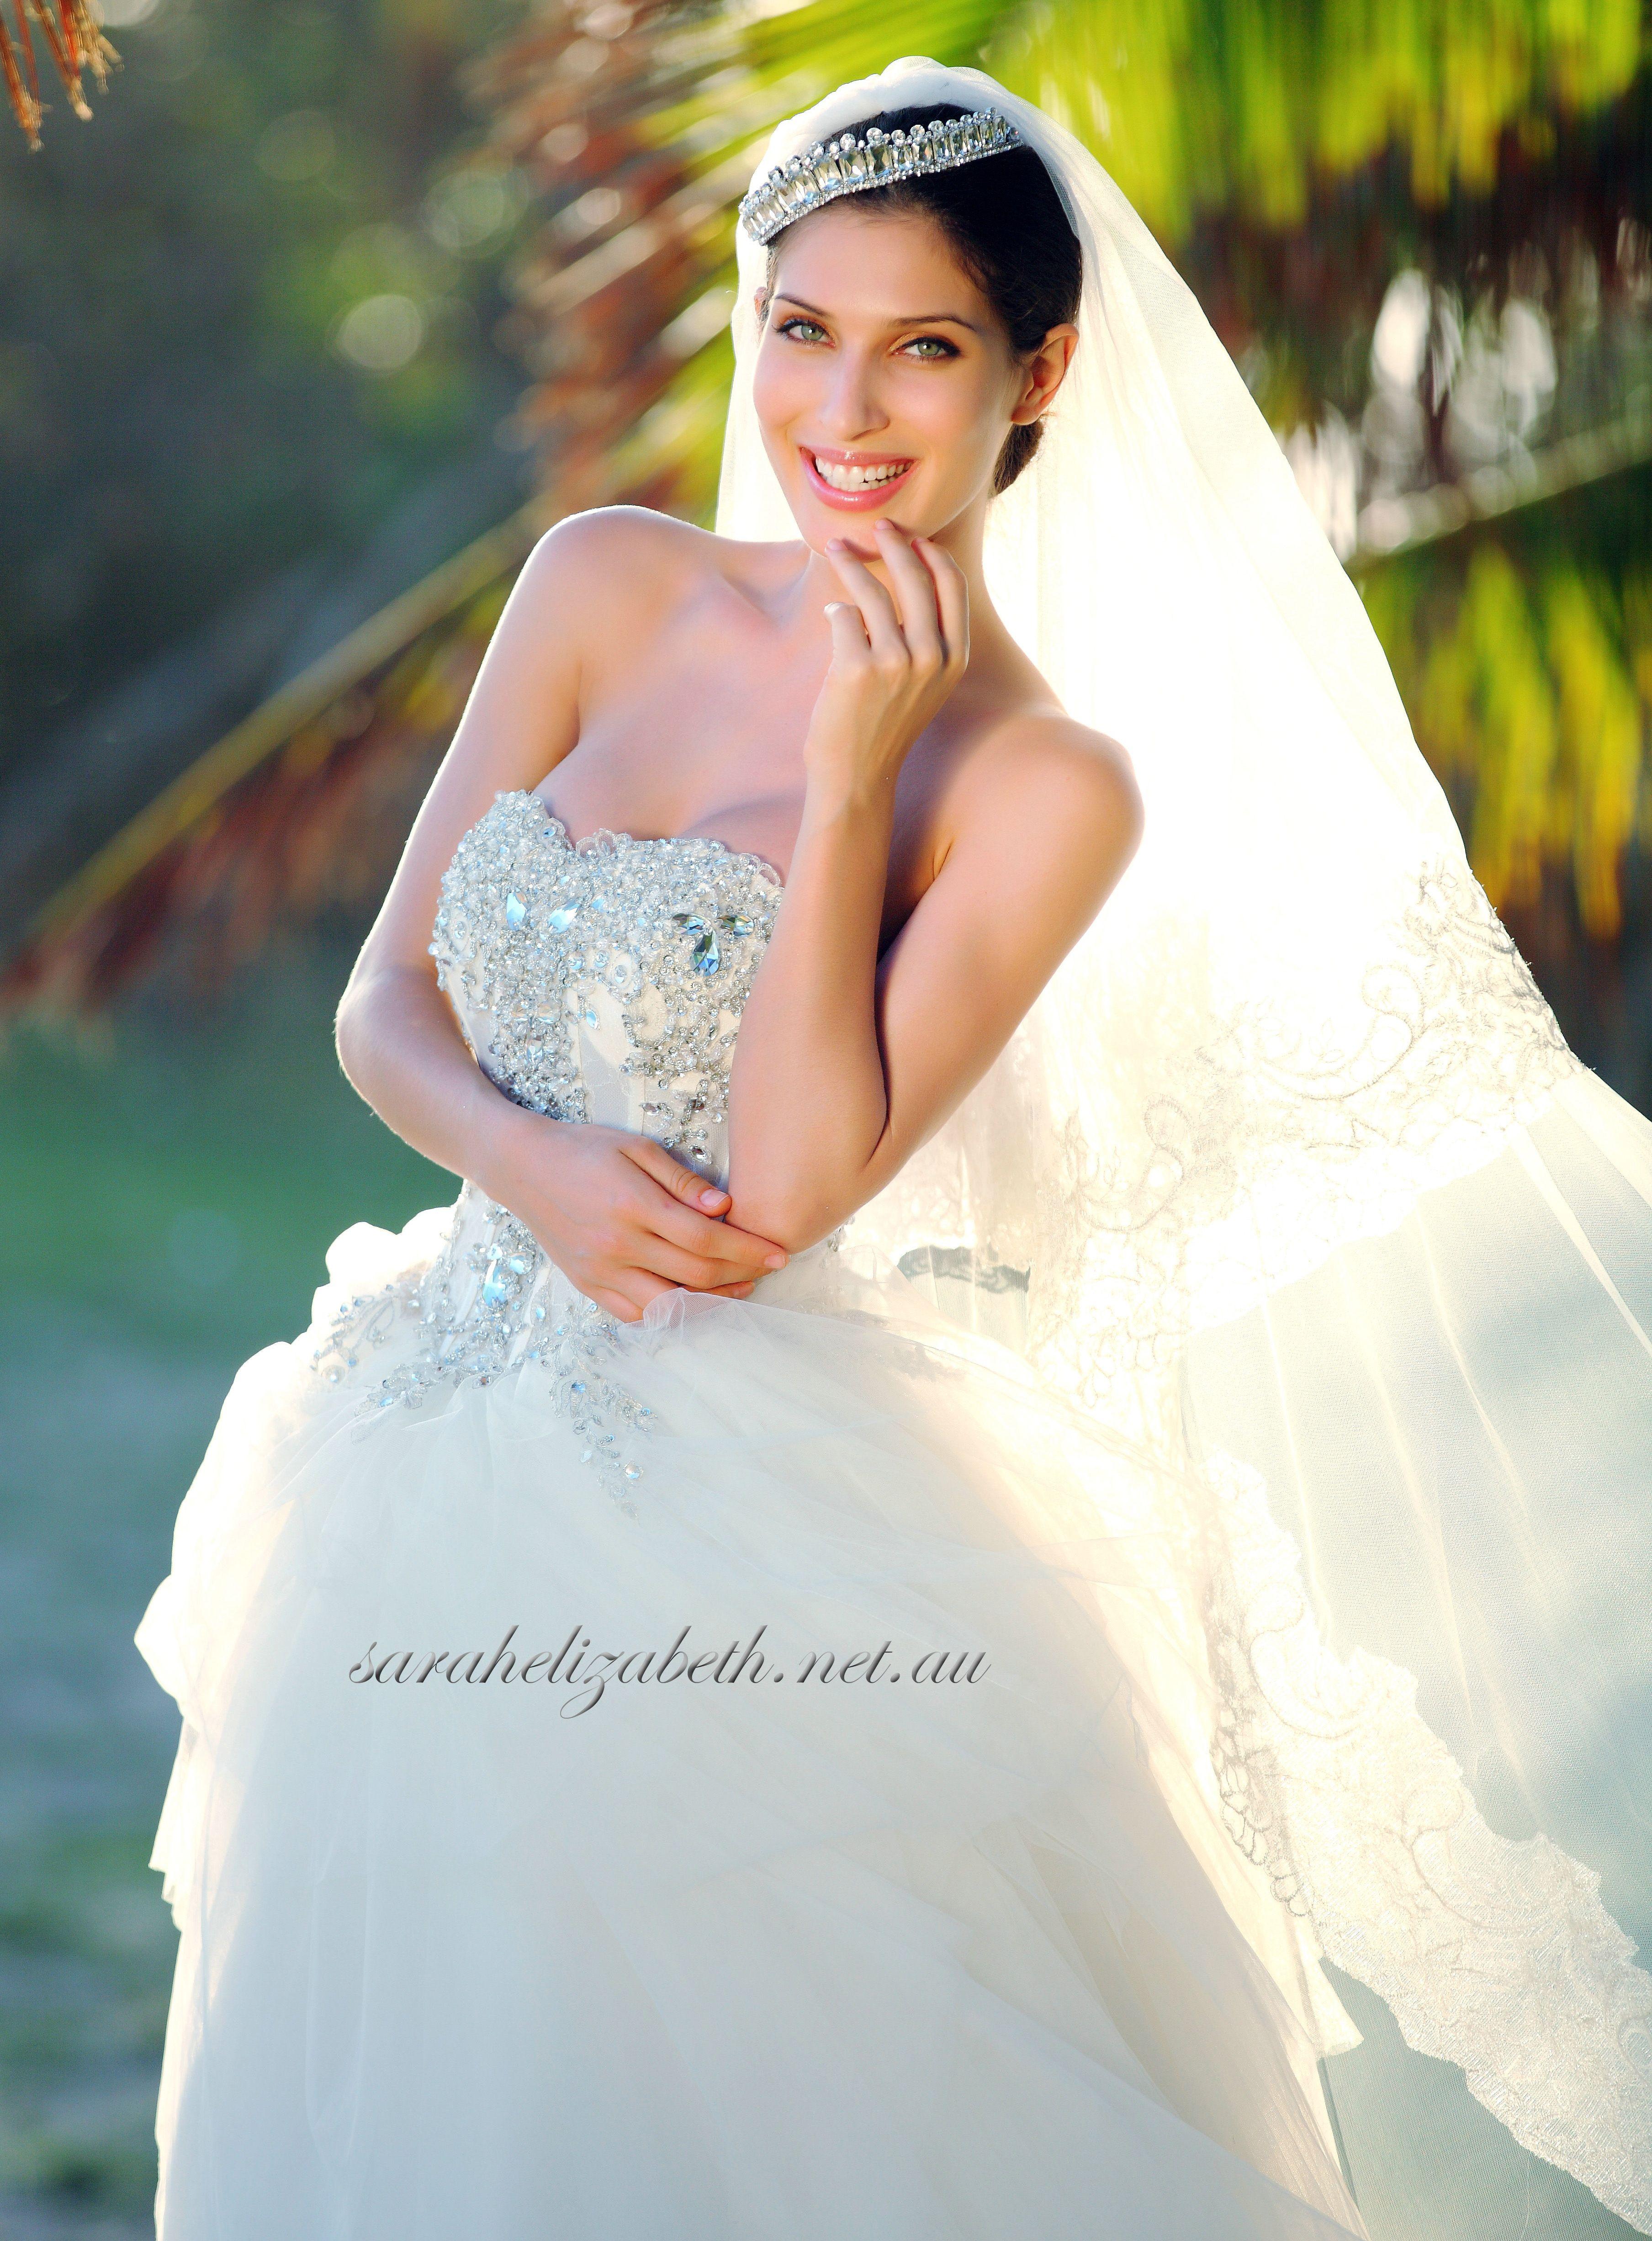 Sarah Elizabeth bridal wear Melbourne | Sarah Elizabeth Bridal Gowns ...